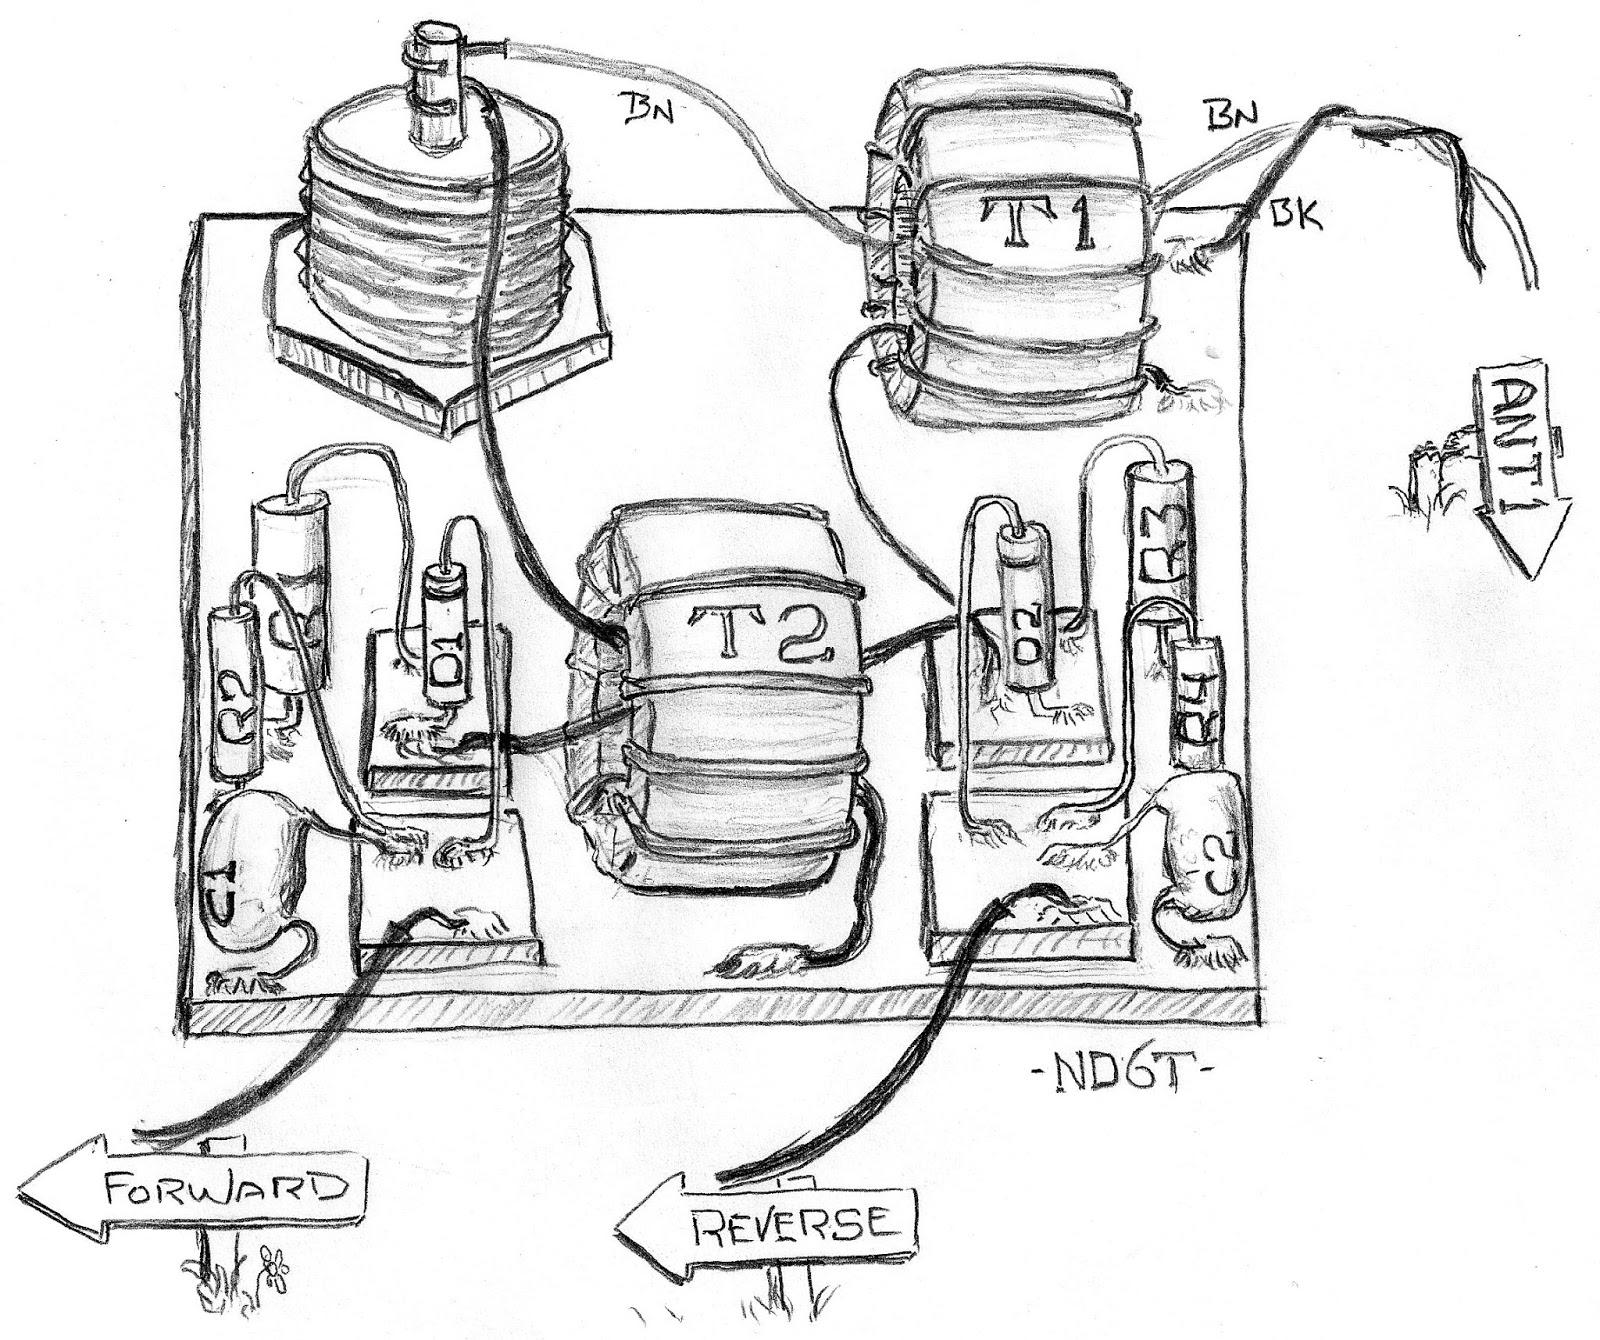 Attenuator Wiring Diagram